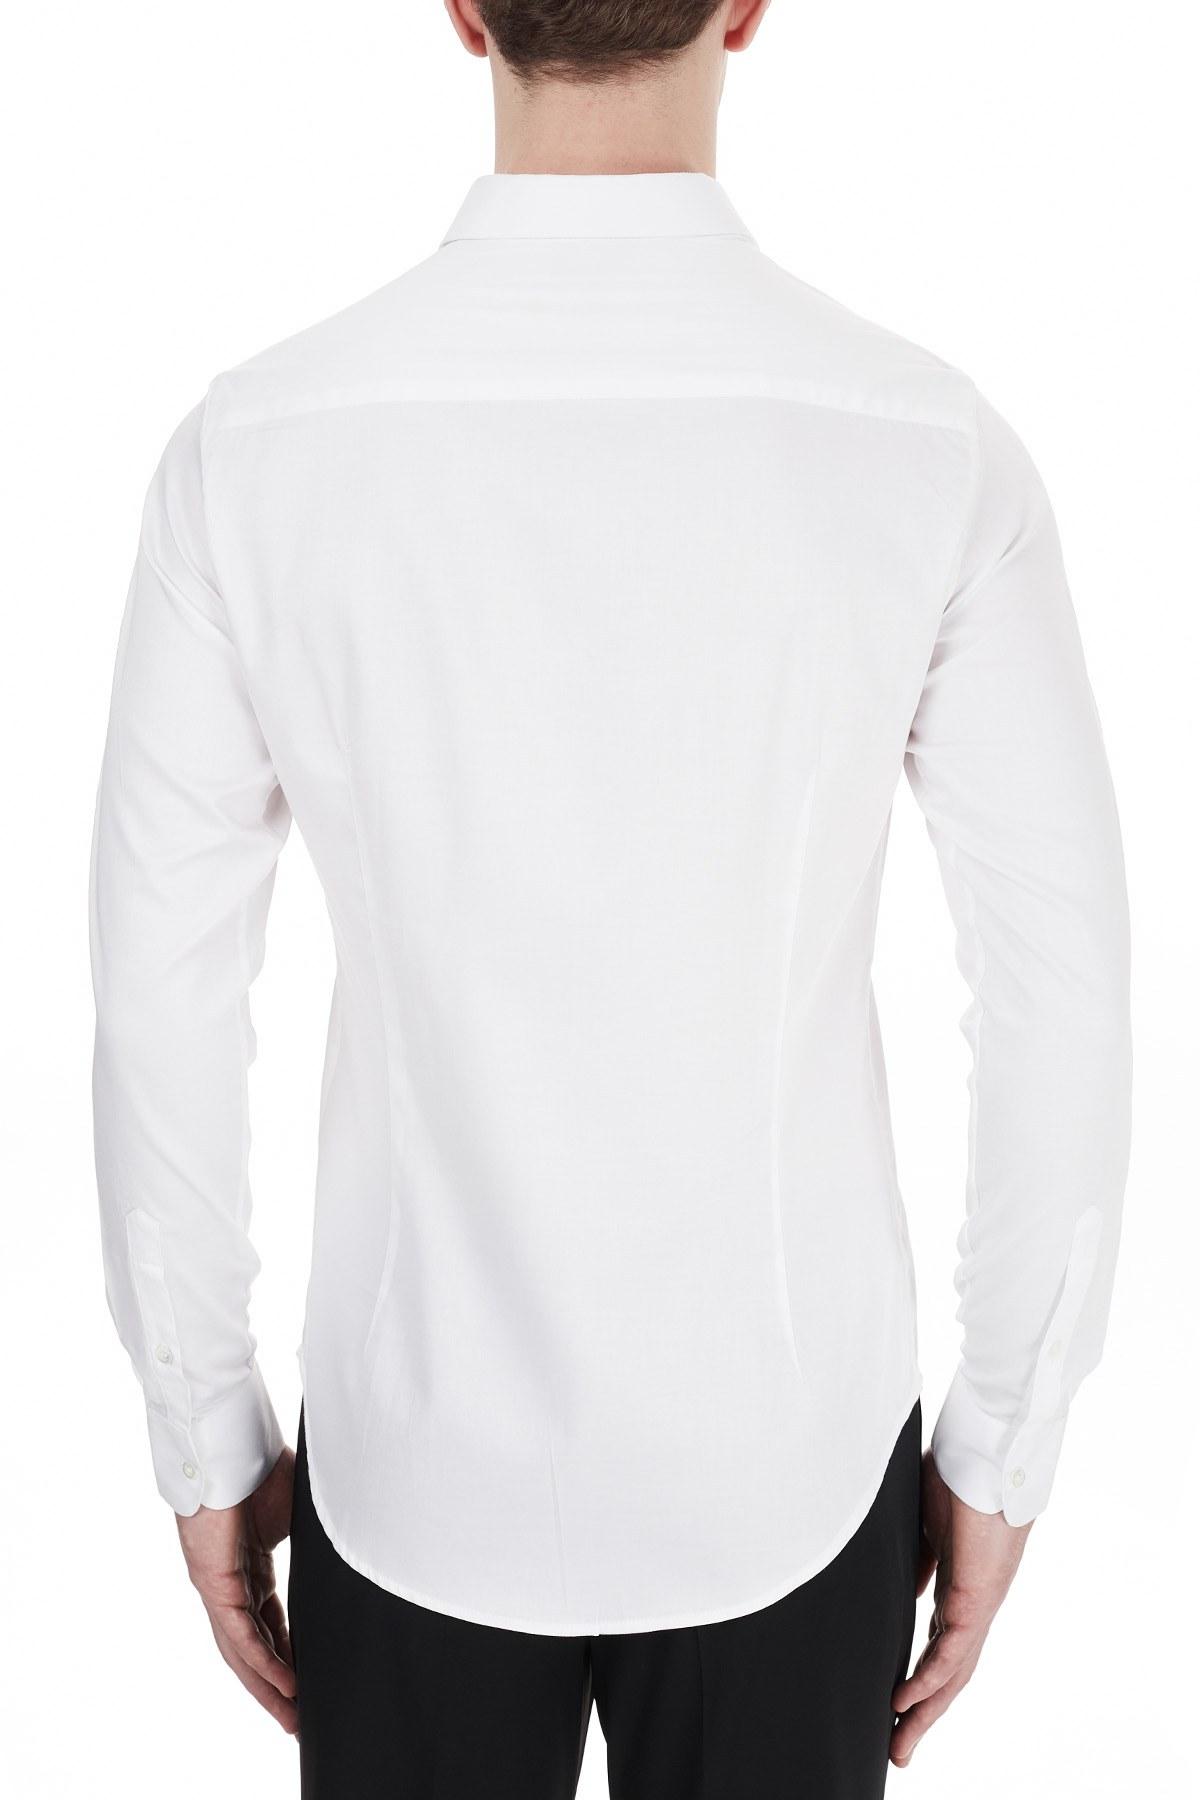 Emporio Armani Slim Fit Düz Yaka Pamuklu Erkek Gömlek 6H1C09 1NB0Z 0100 BEYAZ